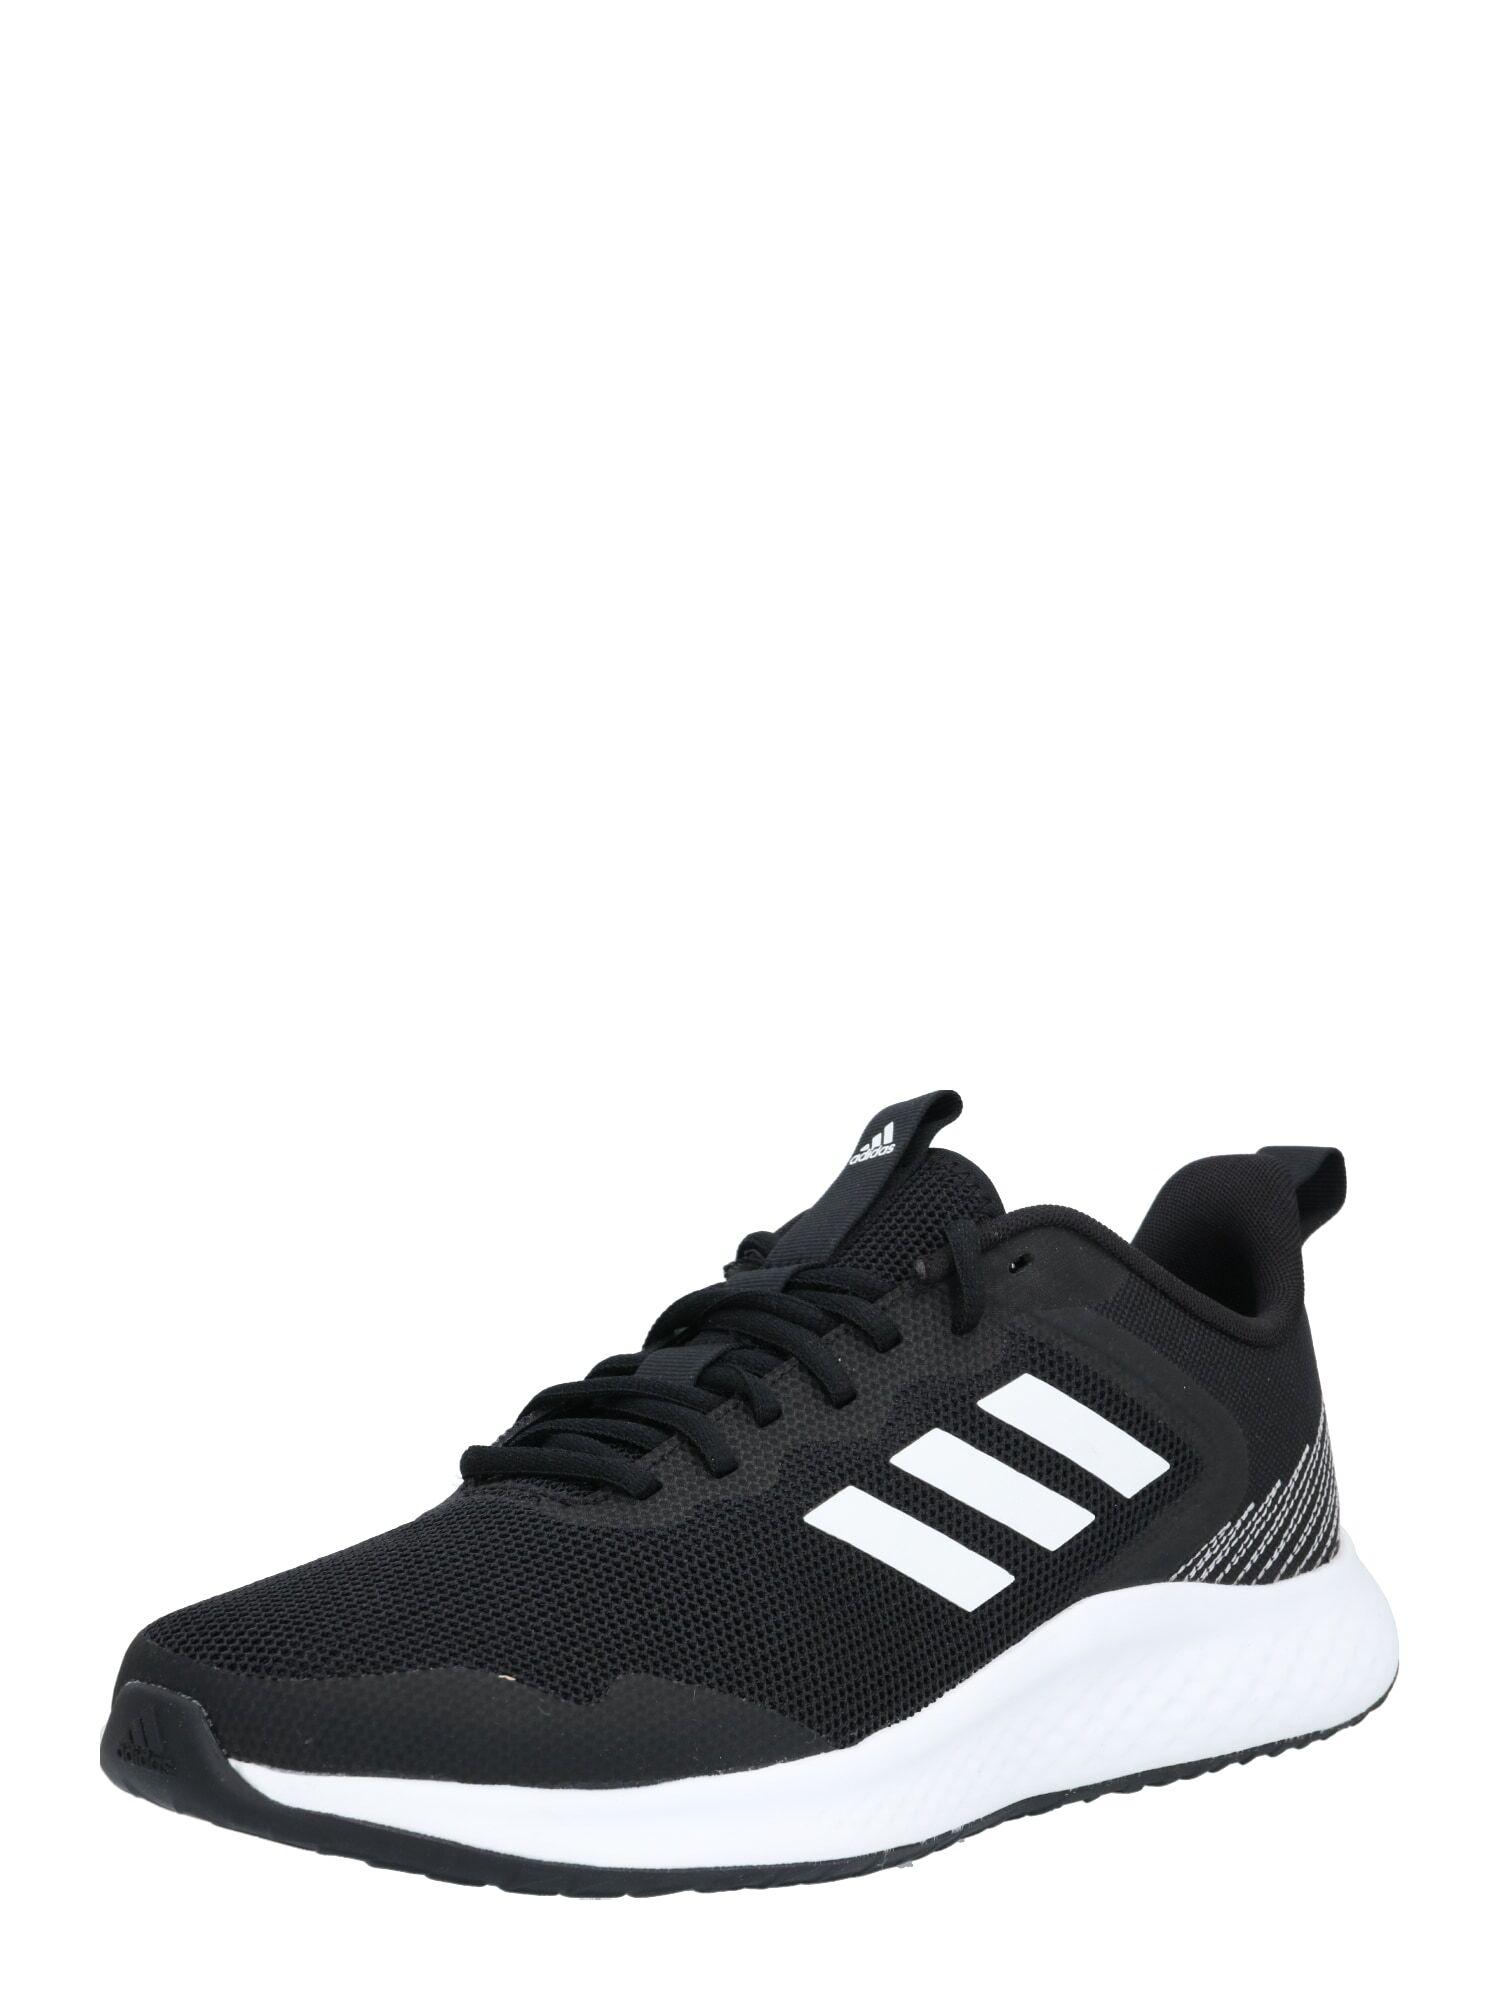 ADIDAS PERFORMANCE Chaussure de course 'Fluid Street'  - Noir - Taille: 9.5 - male